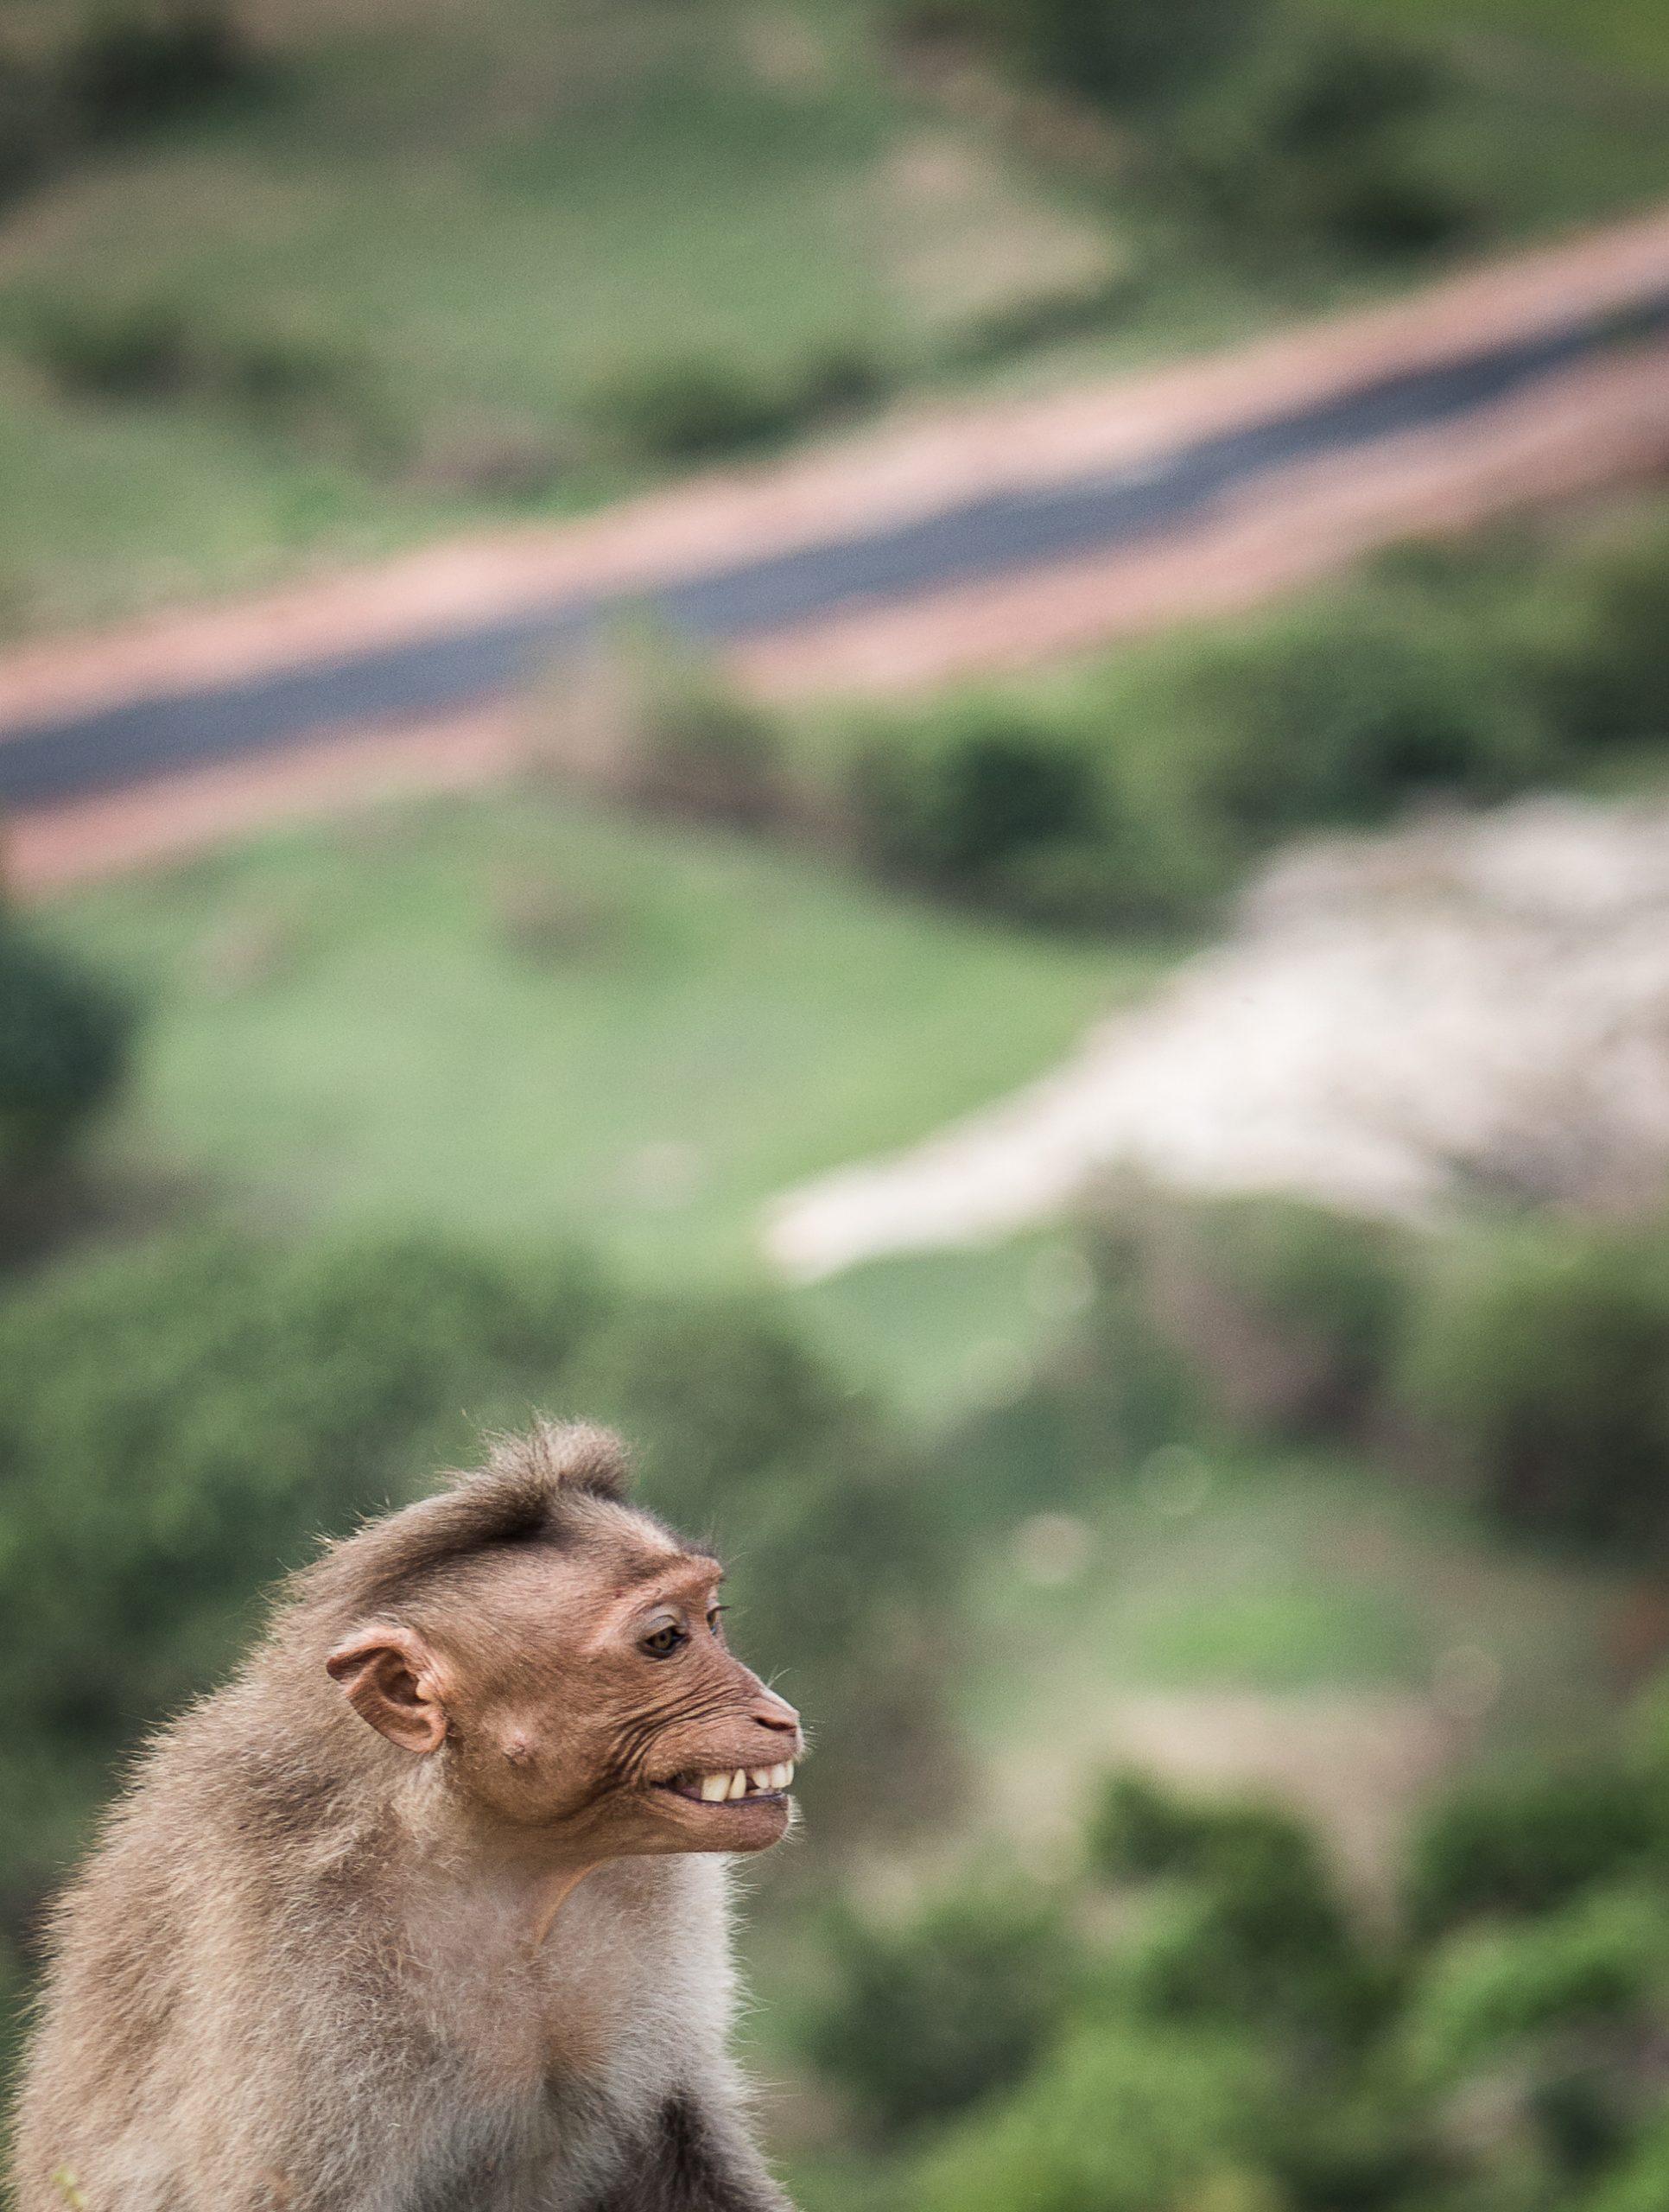 Monkey showing teeth